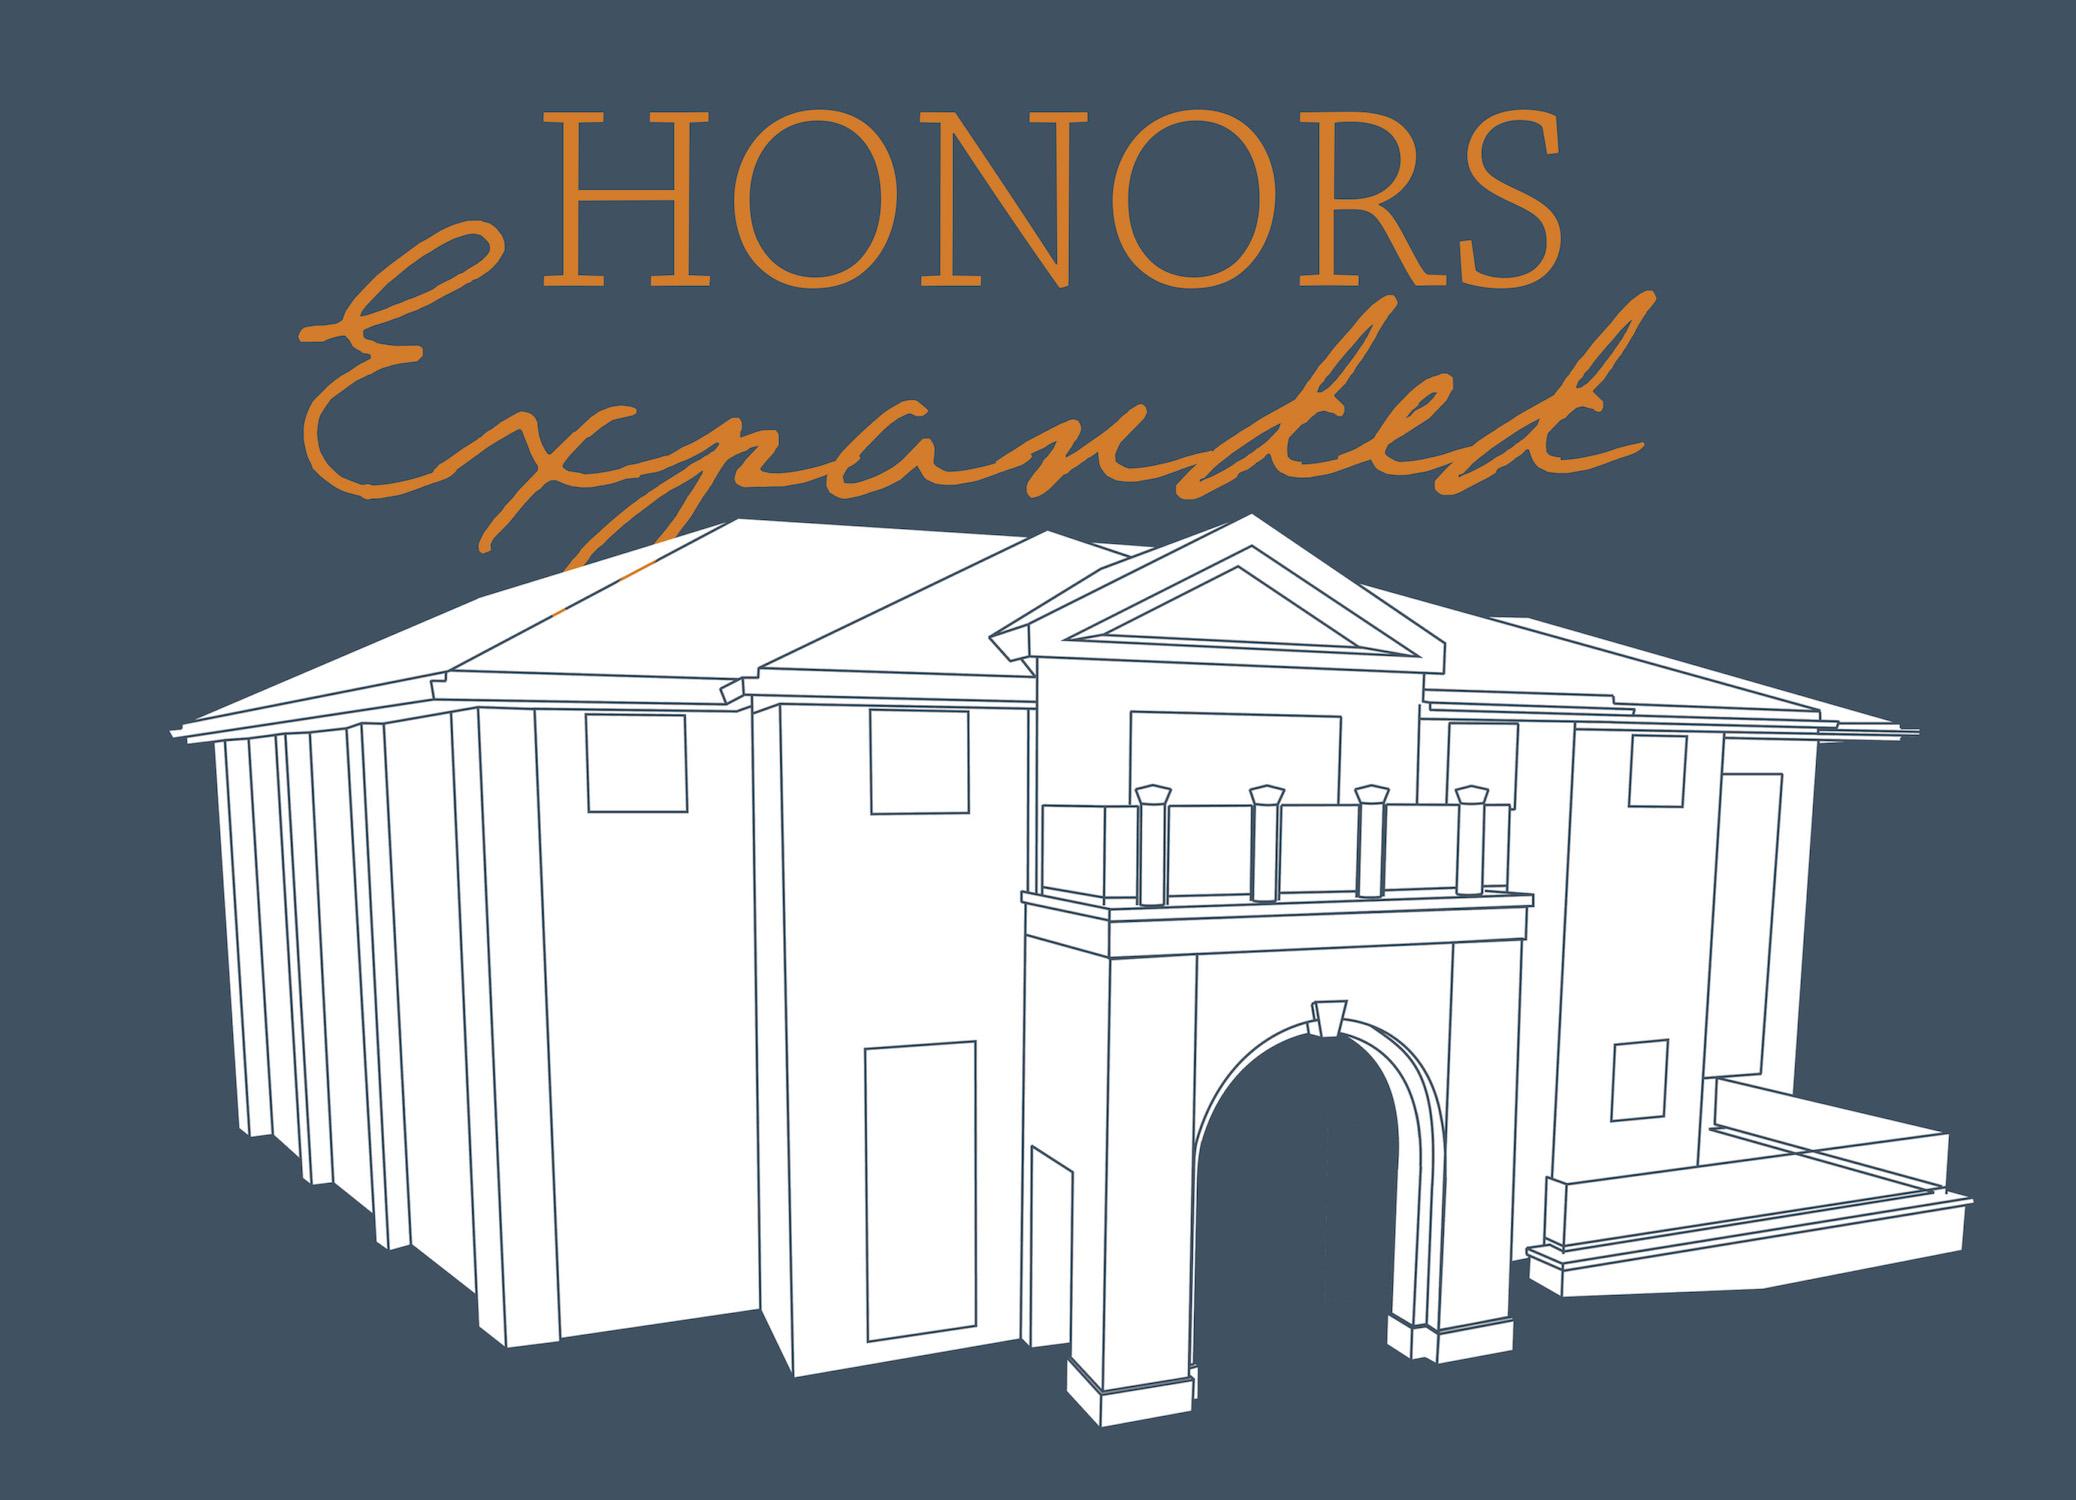 ole miss honor college building illustration.jpg